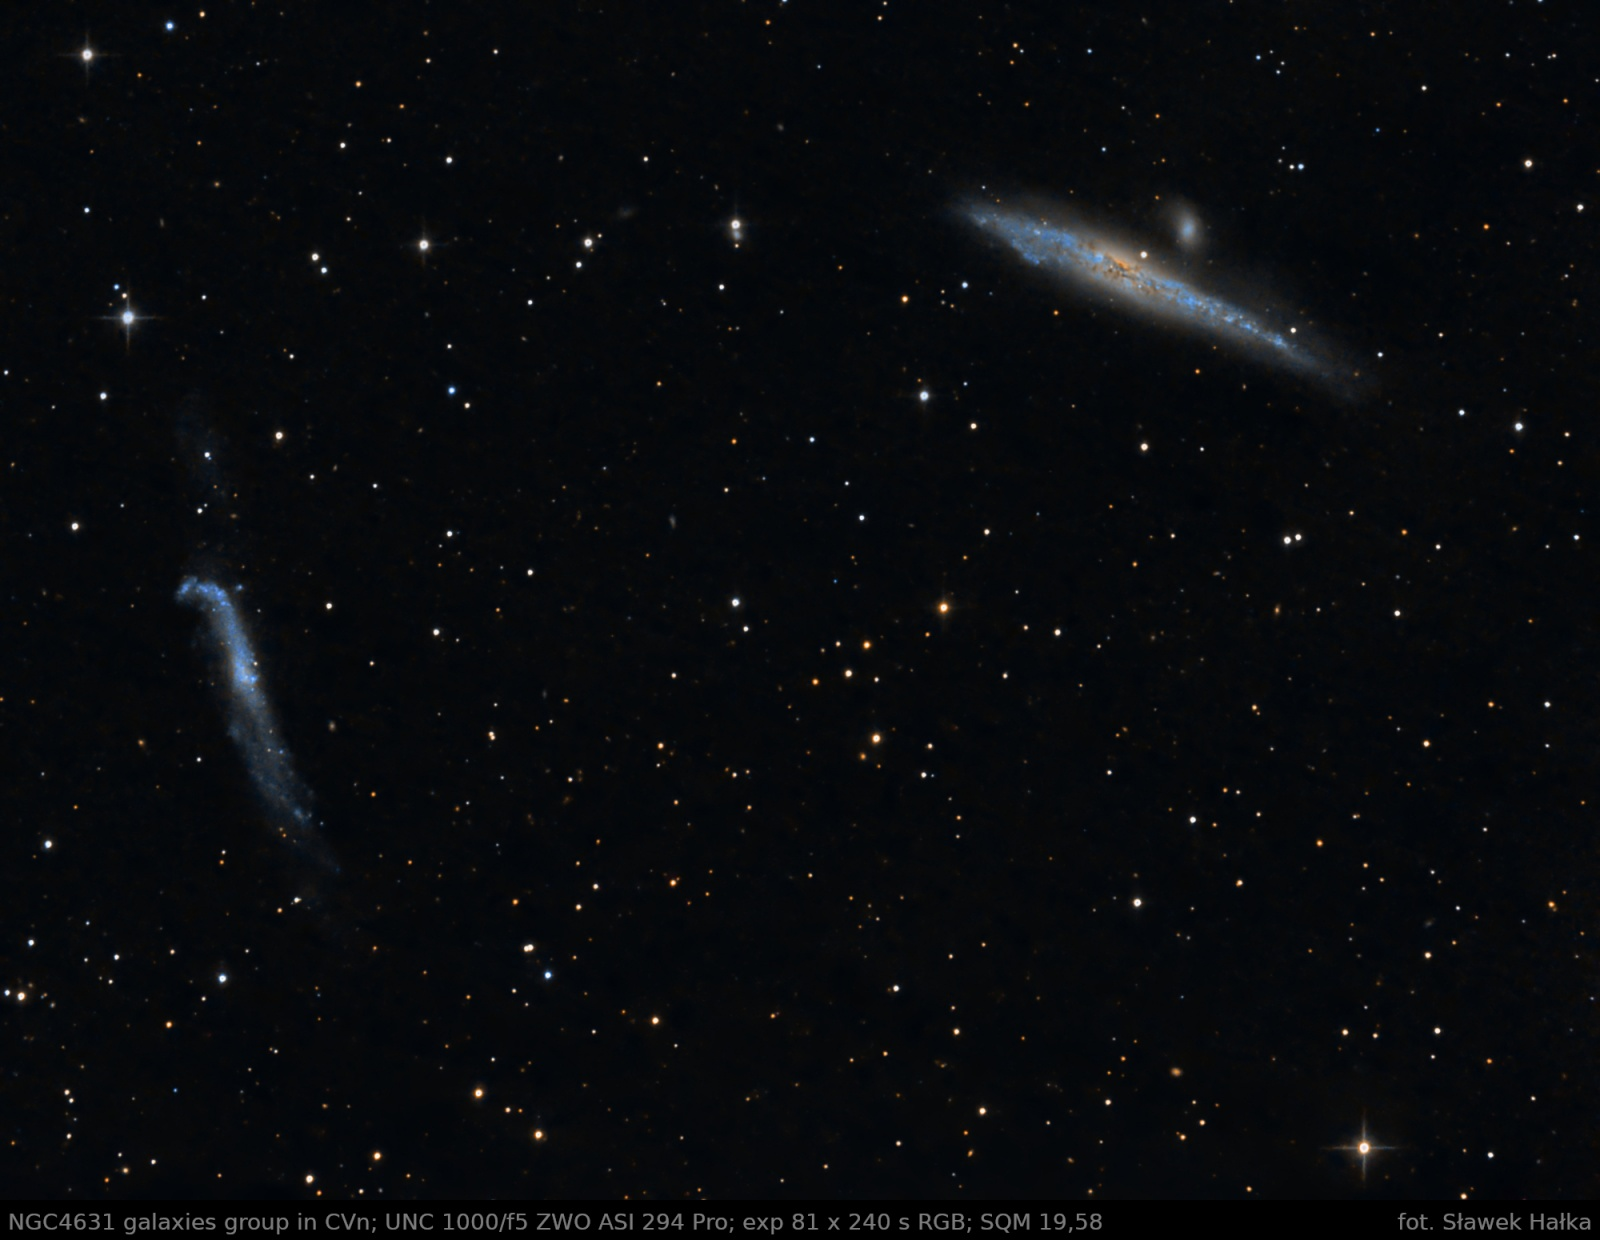 NGC4631_crop_3200_2400_DBE2_resize_2000_1500.thumb.jpg.76f0c1bba62bc6cea208dce6f889f221.jpg